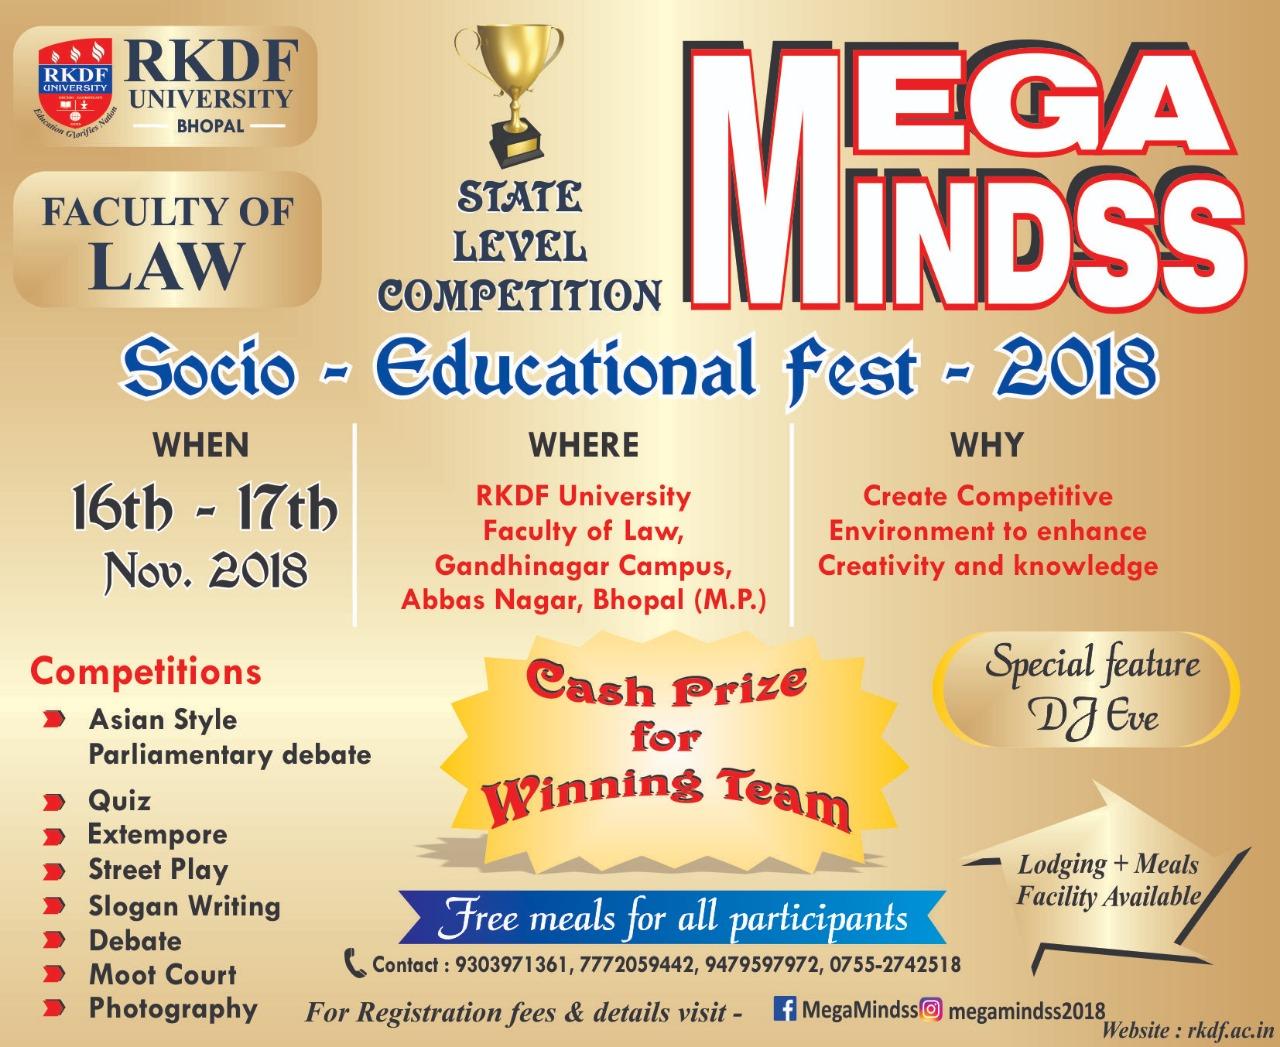 MEgamindss fest RKDF university bhopal